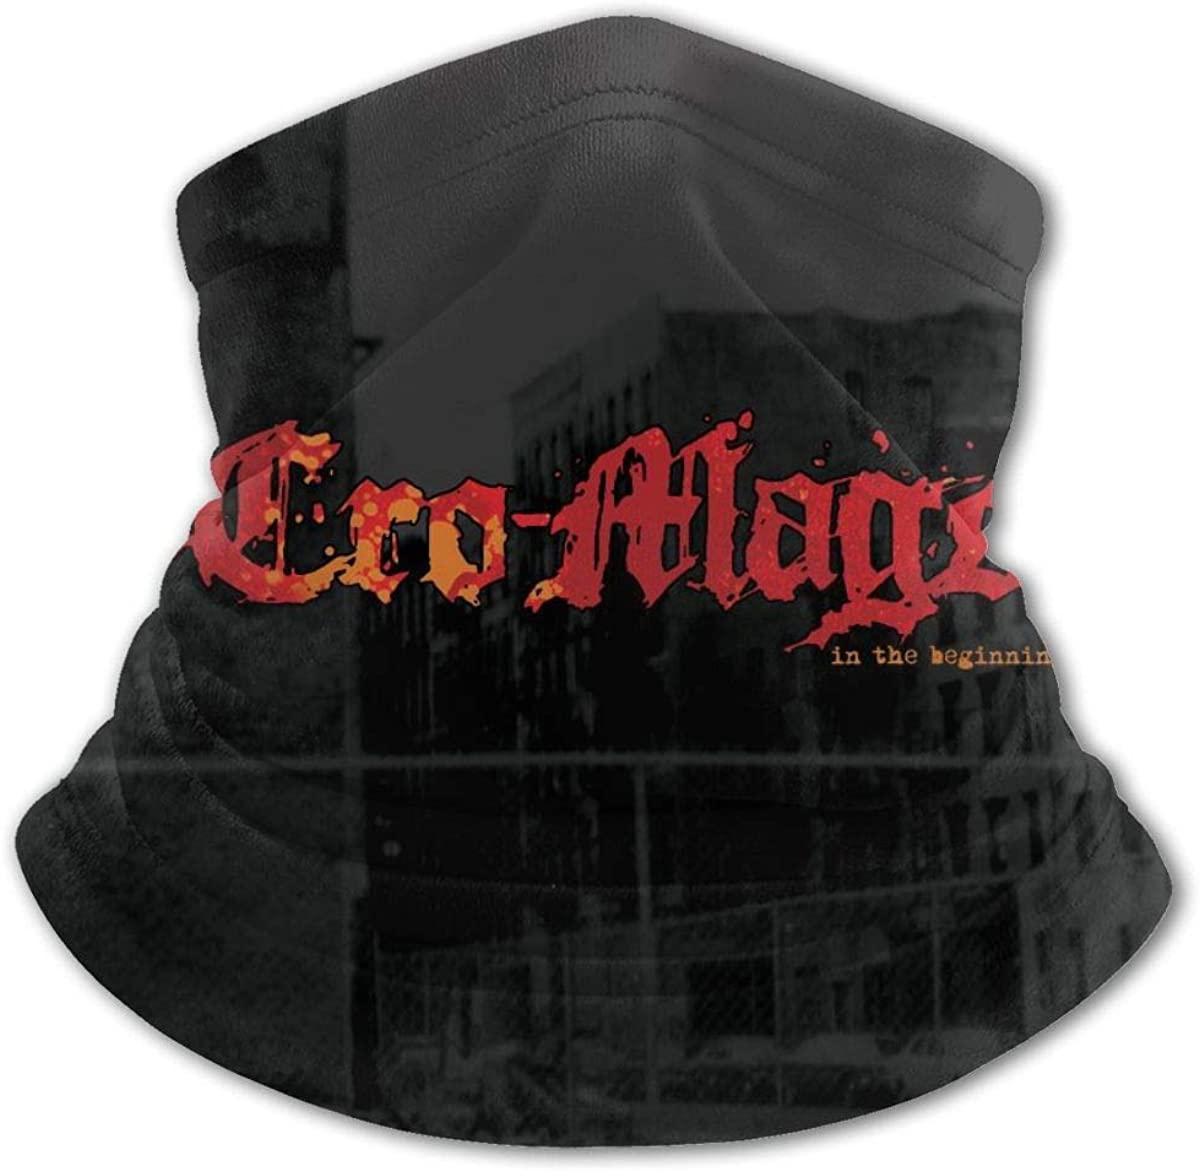 Cro-Mags Face Mask Balaclava Protection from Dust, Uv & Aerosols - Reusable Bandana Face Cover Black